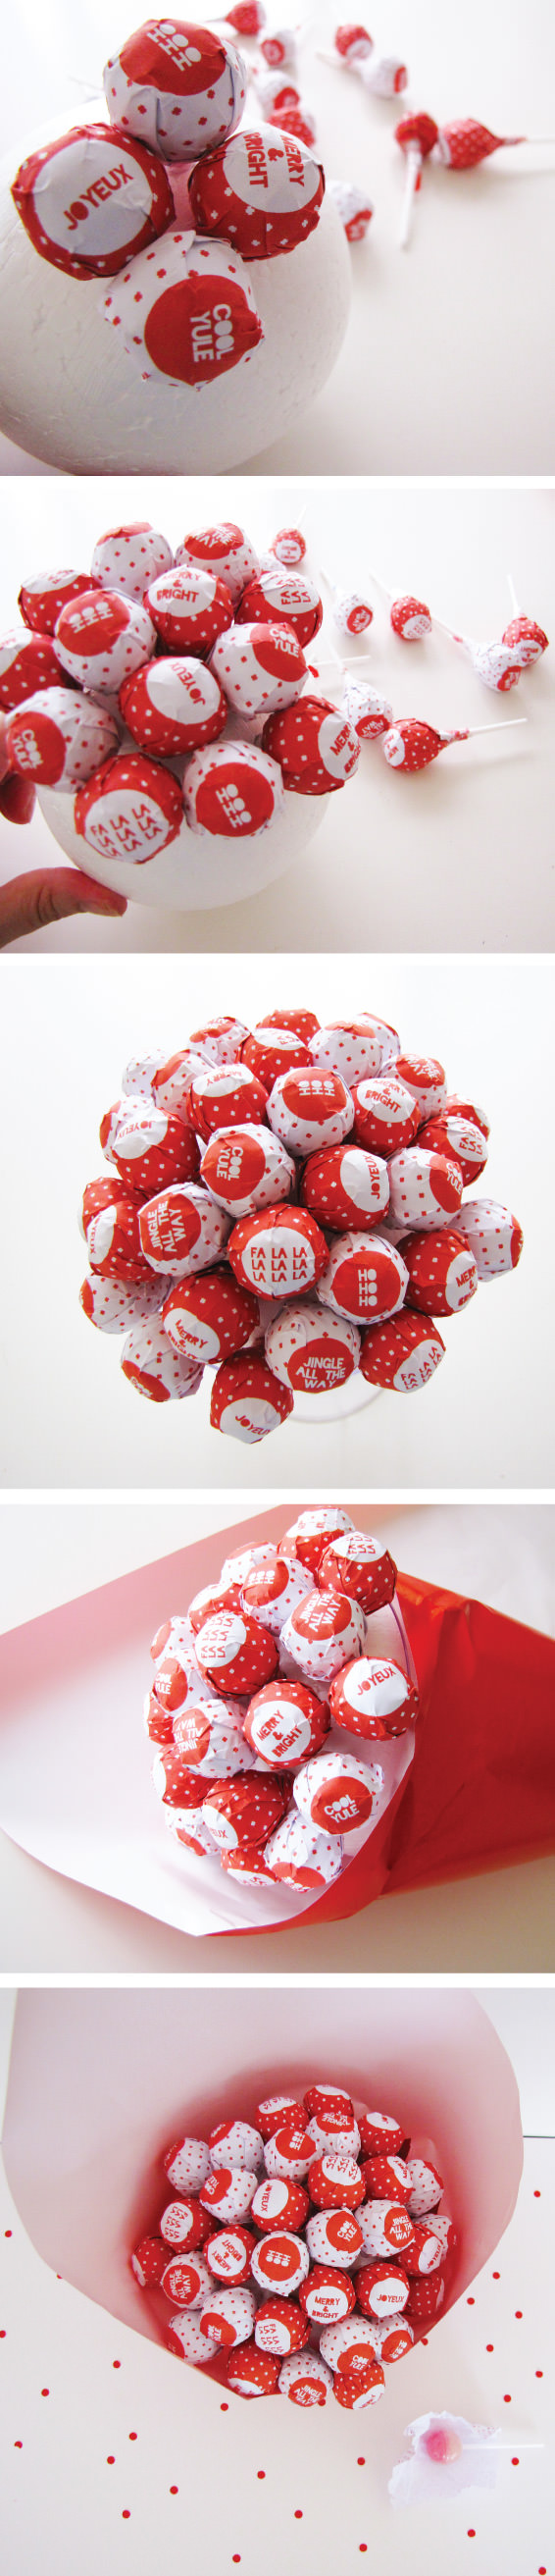 TOMFO-DIY-LollipopbouquetTUTORIAL2